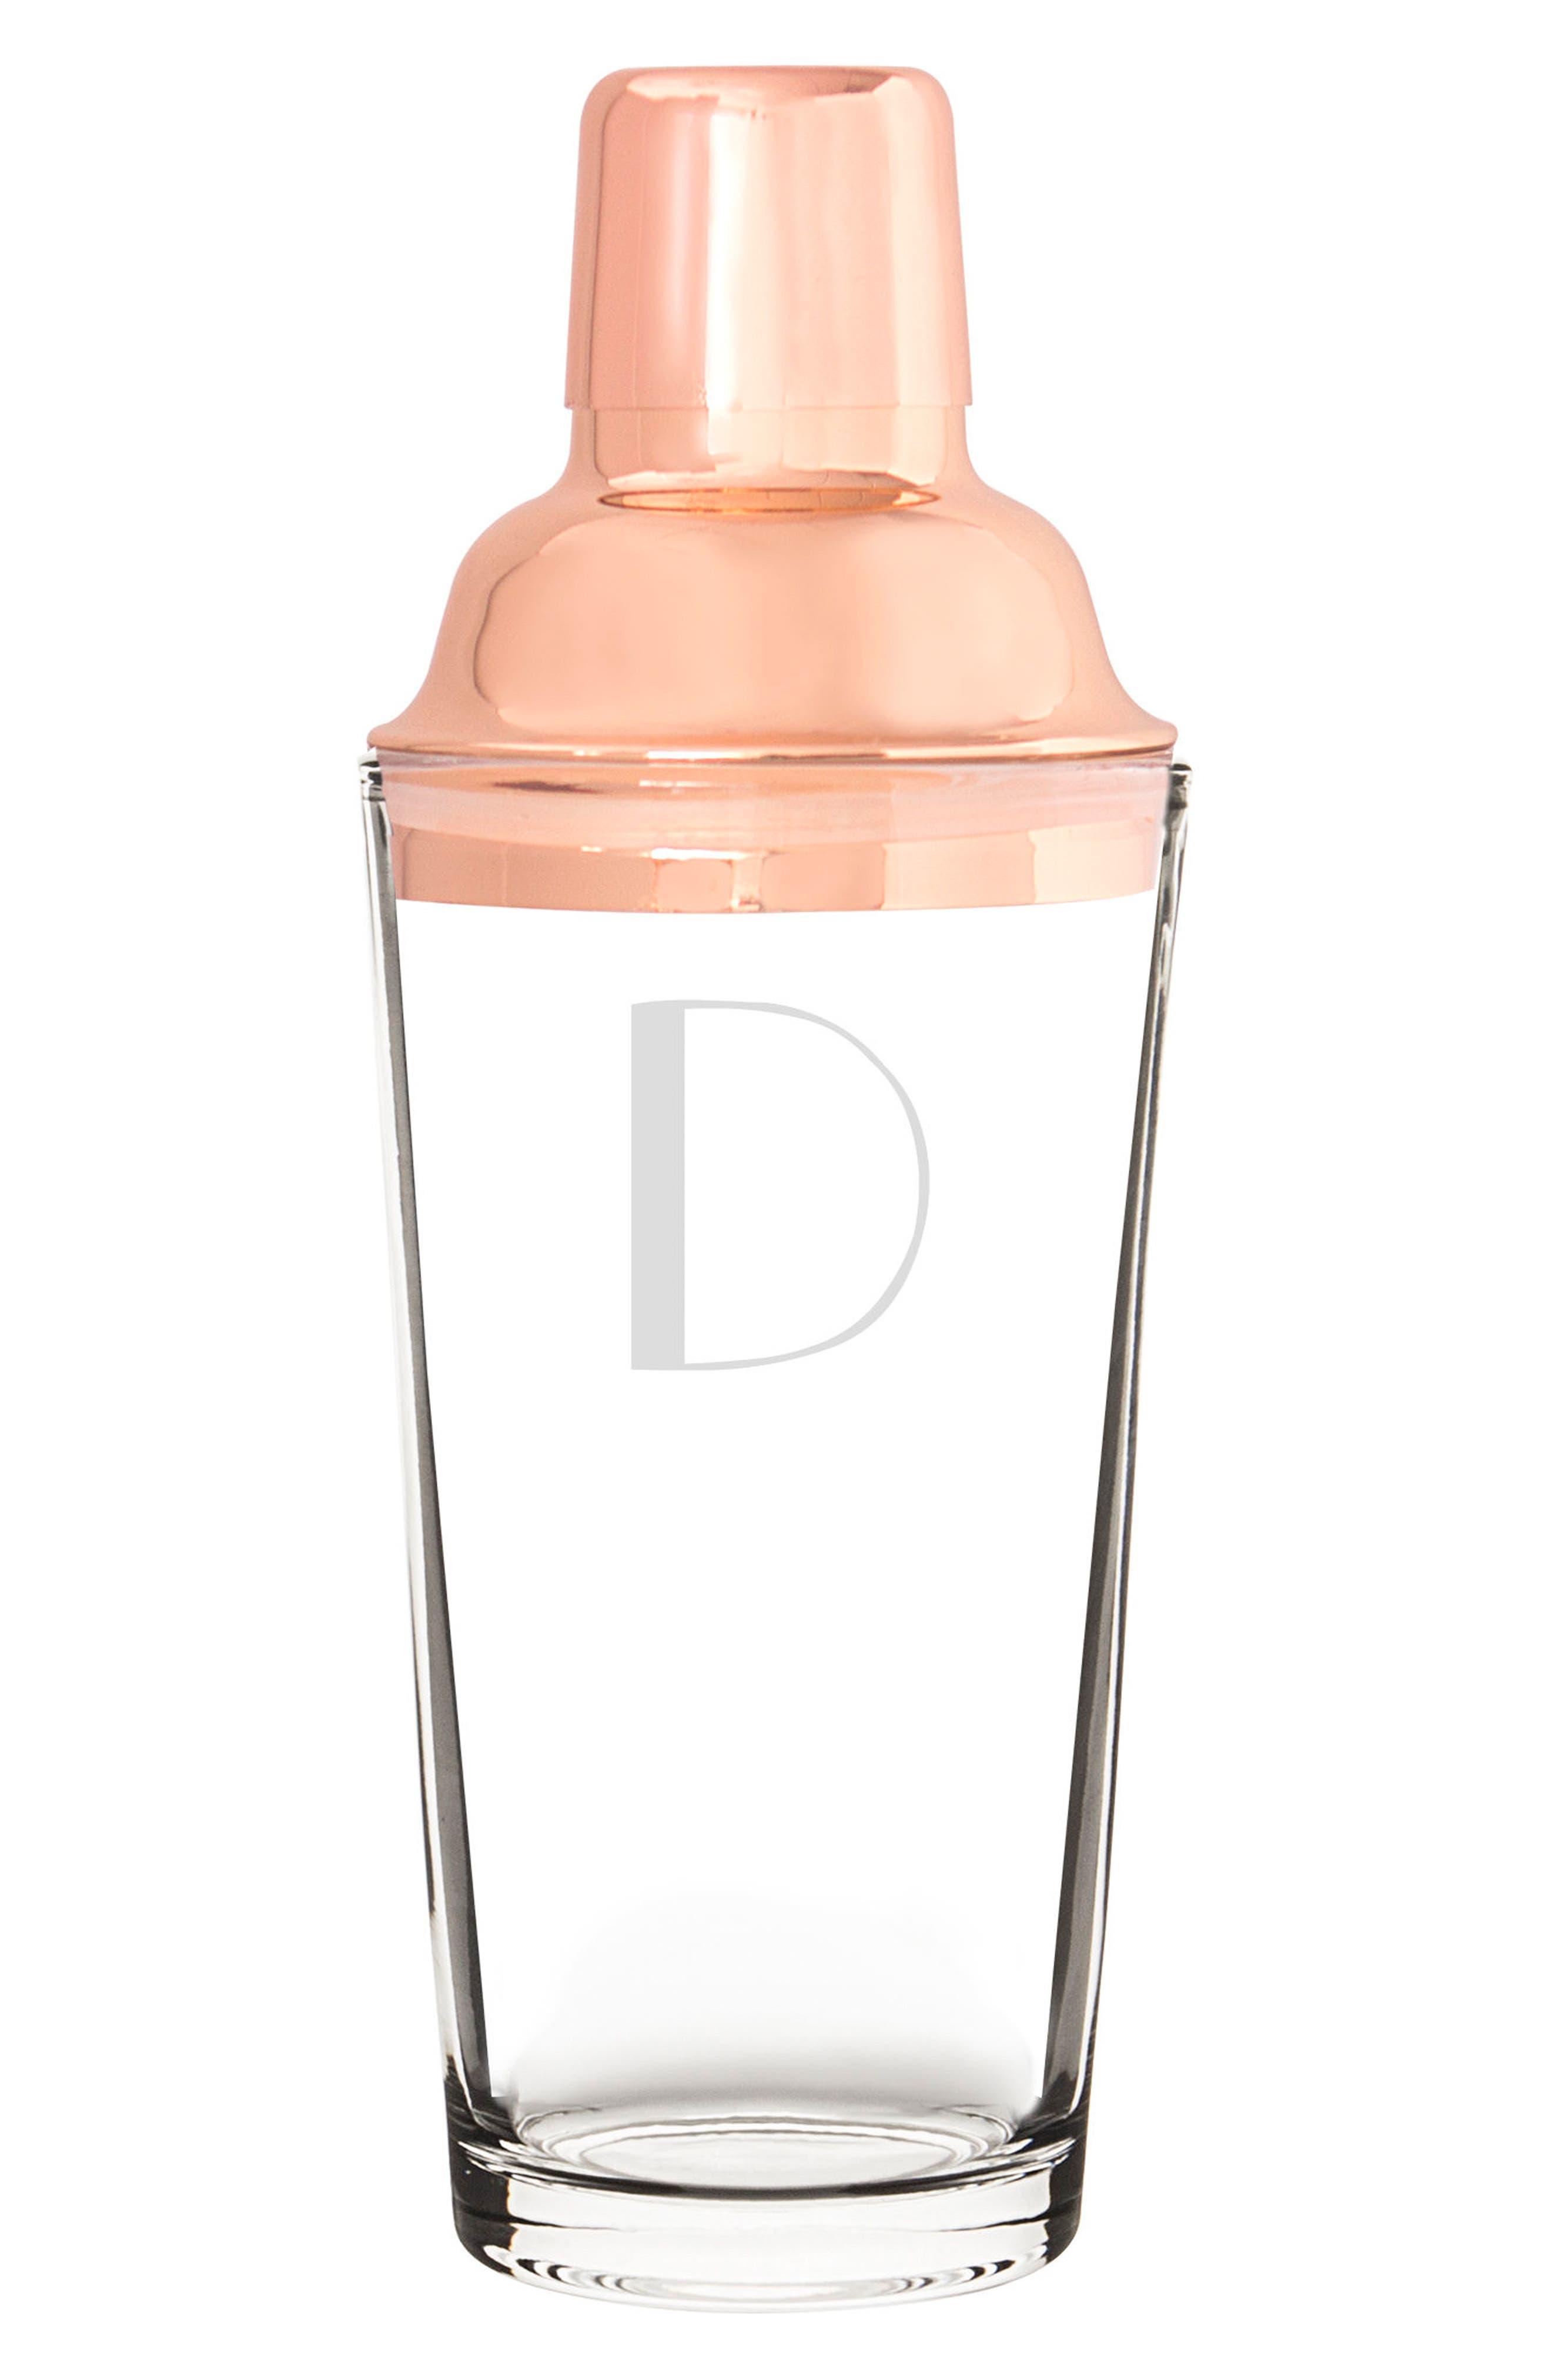 Monogram Coppertone Cocktail Shaker,                             Main thumbnail 5, color,